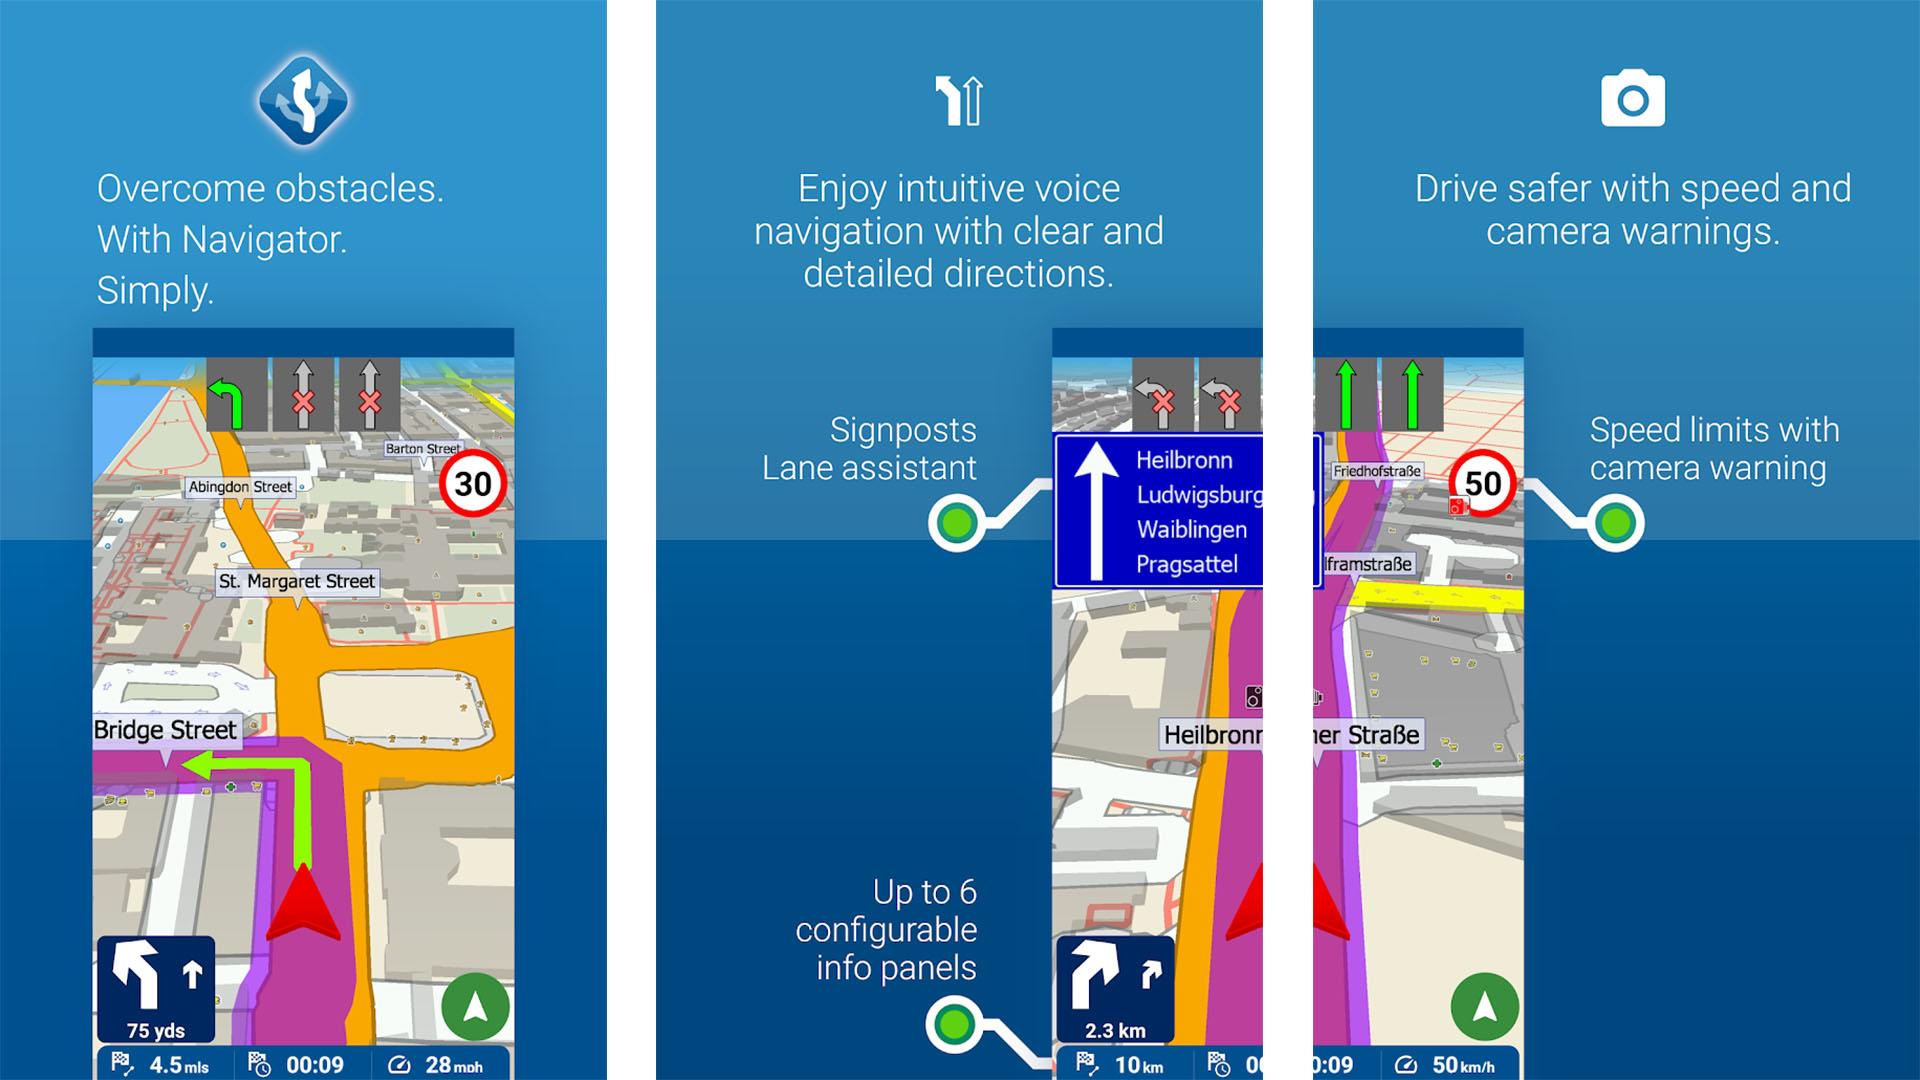 MapFactor screenshot 2020